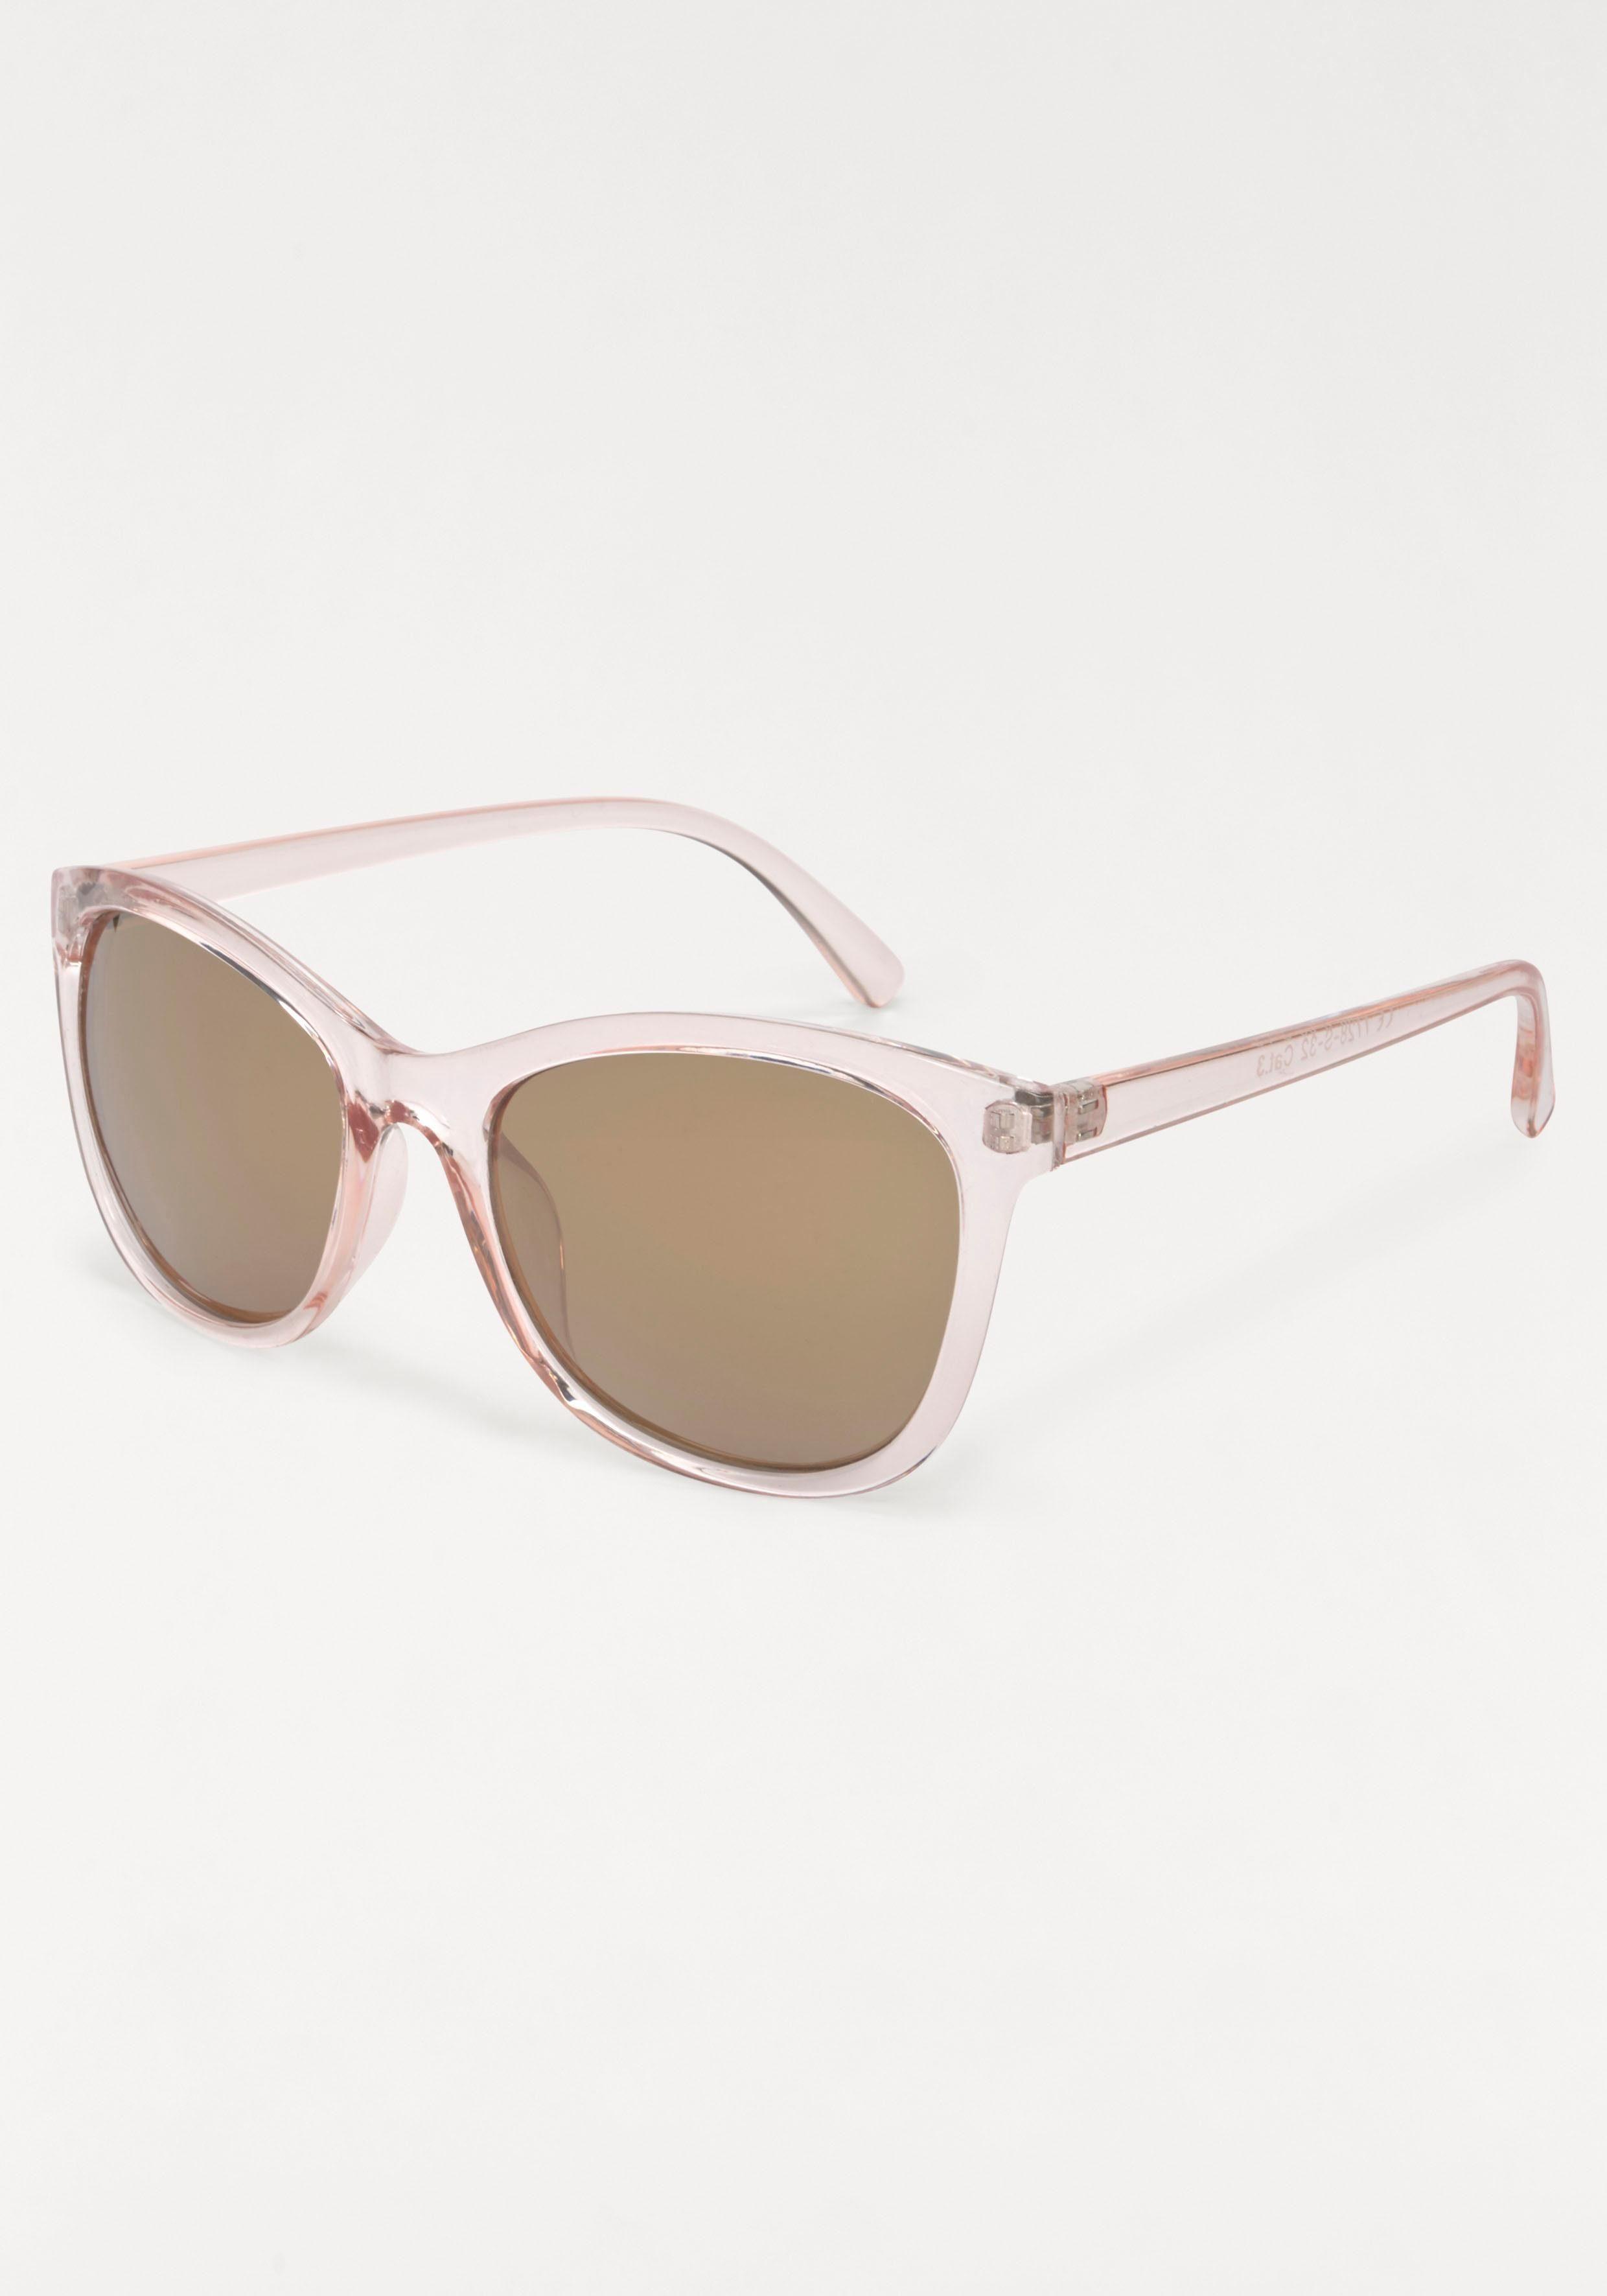 Sonnenbrille leichte Butterfly Form